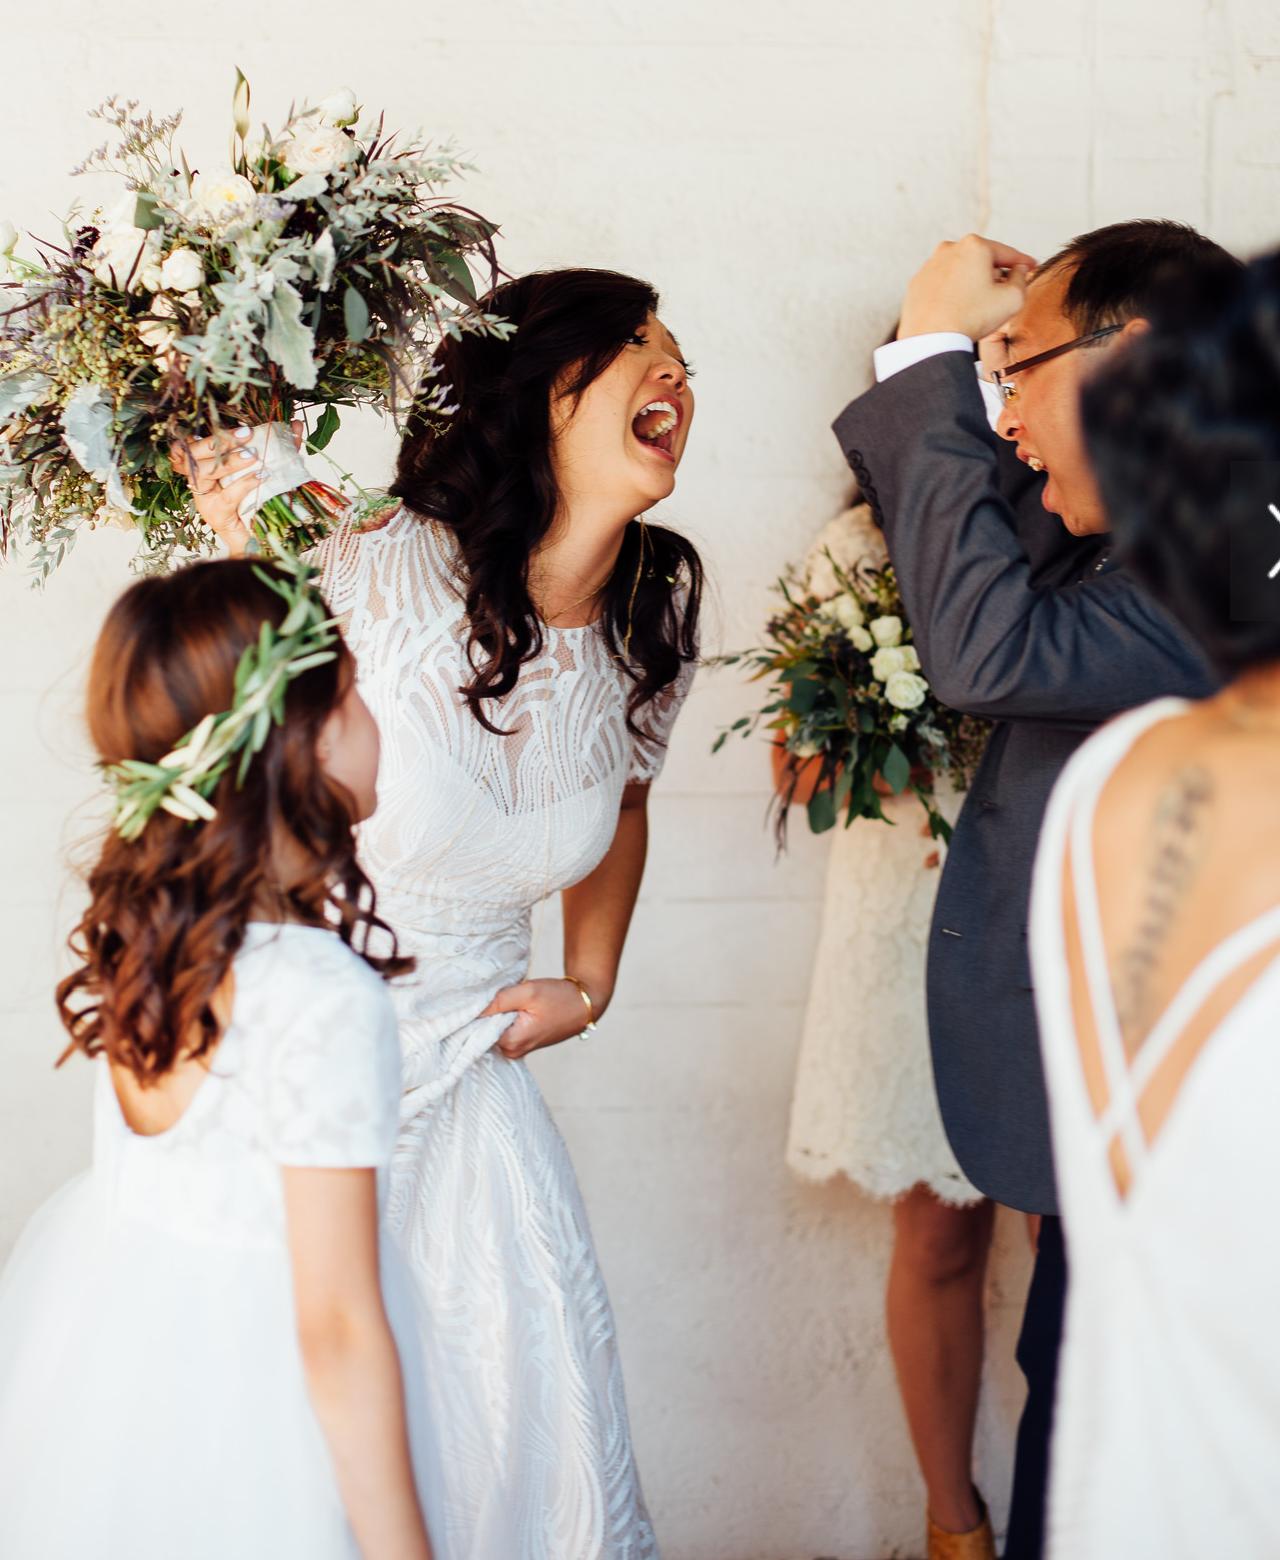 las-vegas-wedding-planner-pantone-color-of-the-year-2017-greenery